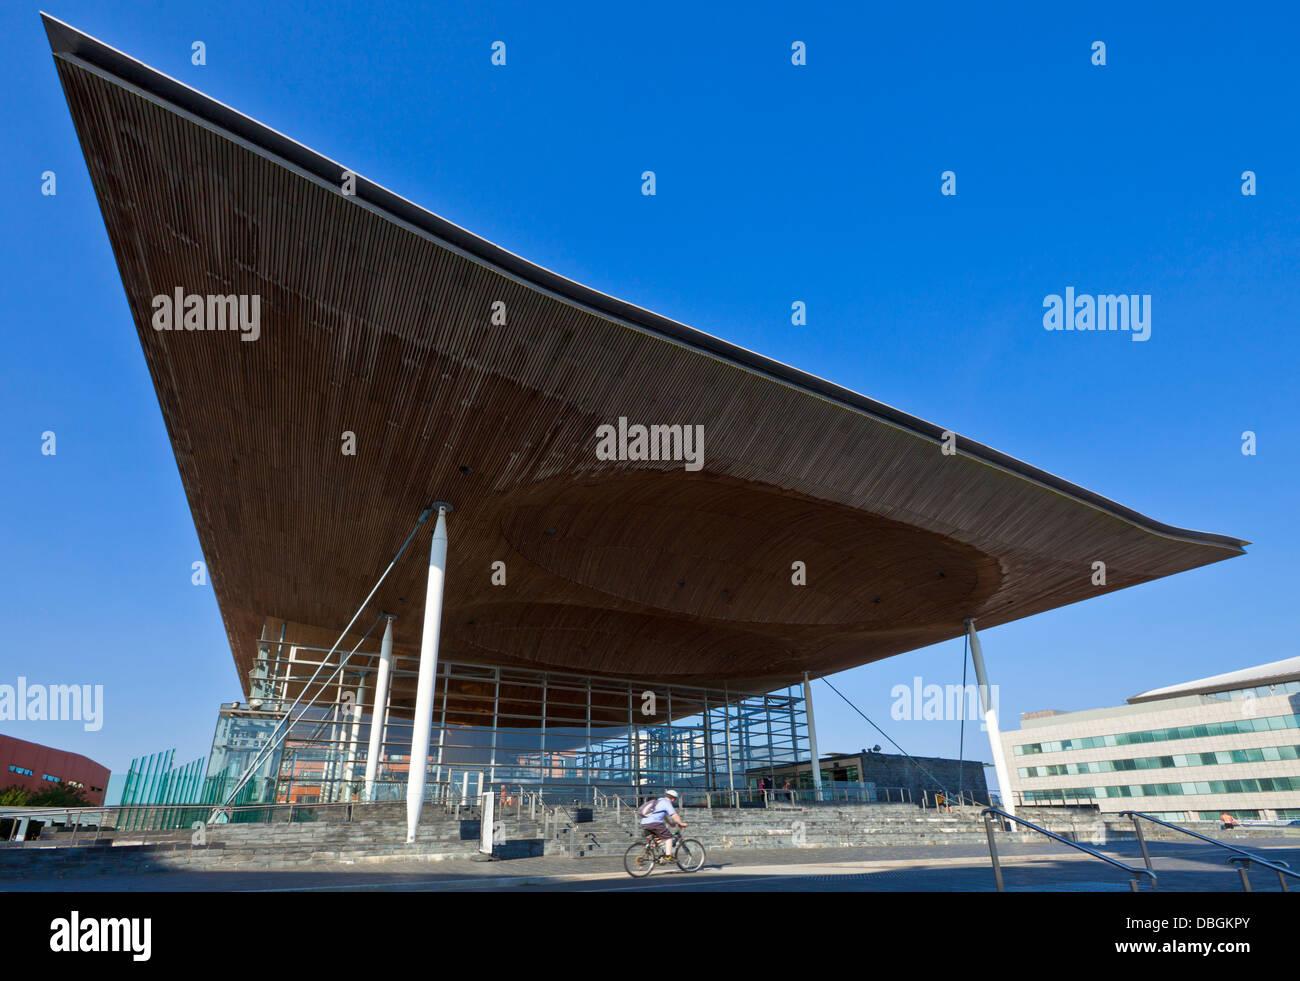 The Senedd or welsh assembly building Cardiff Bay South Glamorgan Wales UK GB EU - Stock Image